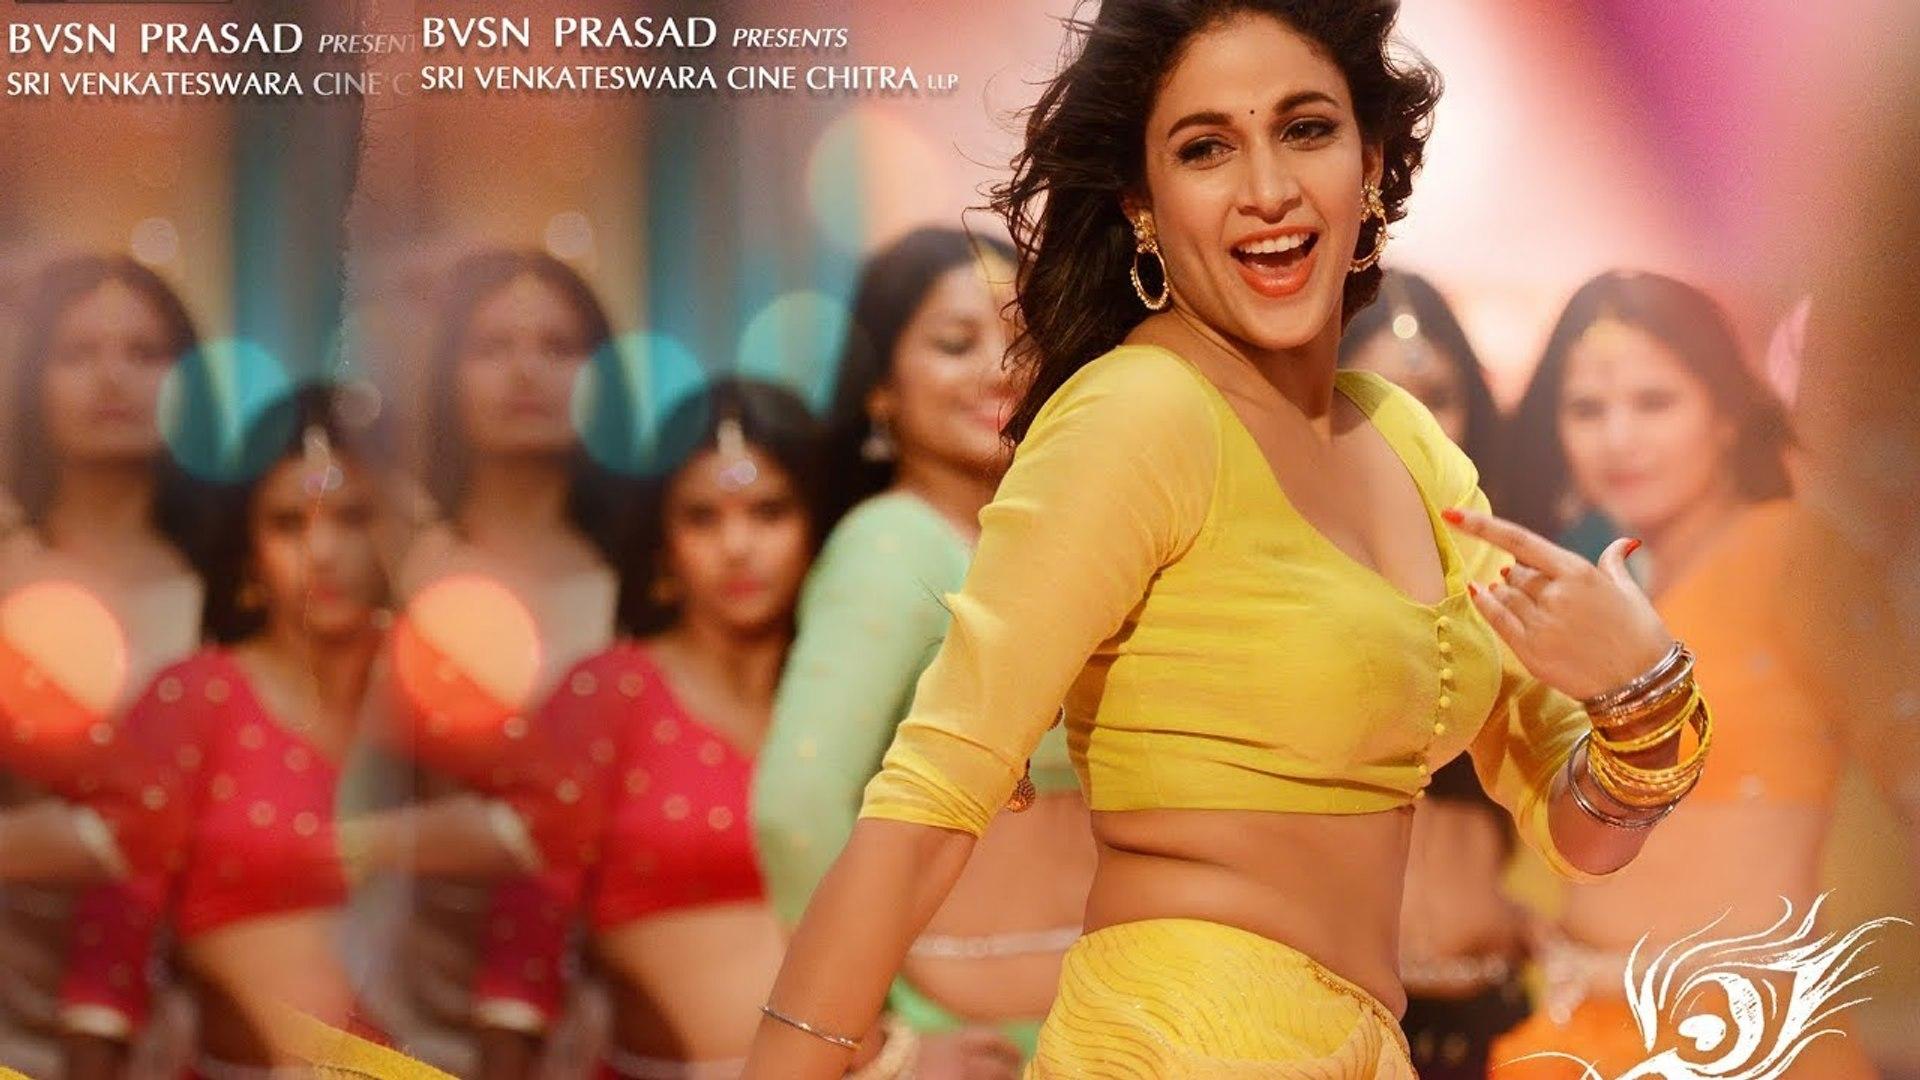 Lavanya Tripathi 2019 New Telugu Hindi Dubbed Blockbuster Movie - 2019 South Hindi Dubbed Movies